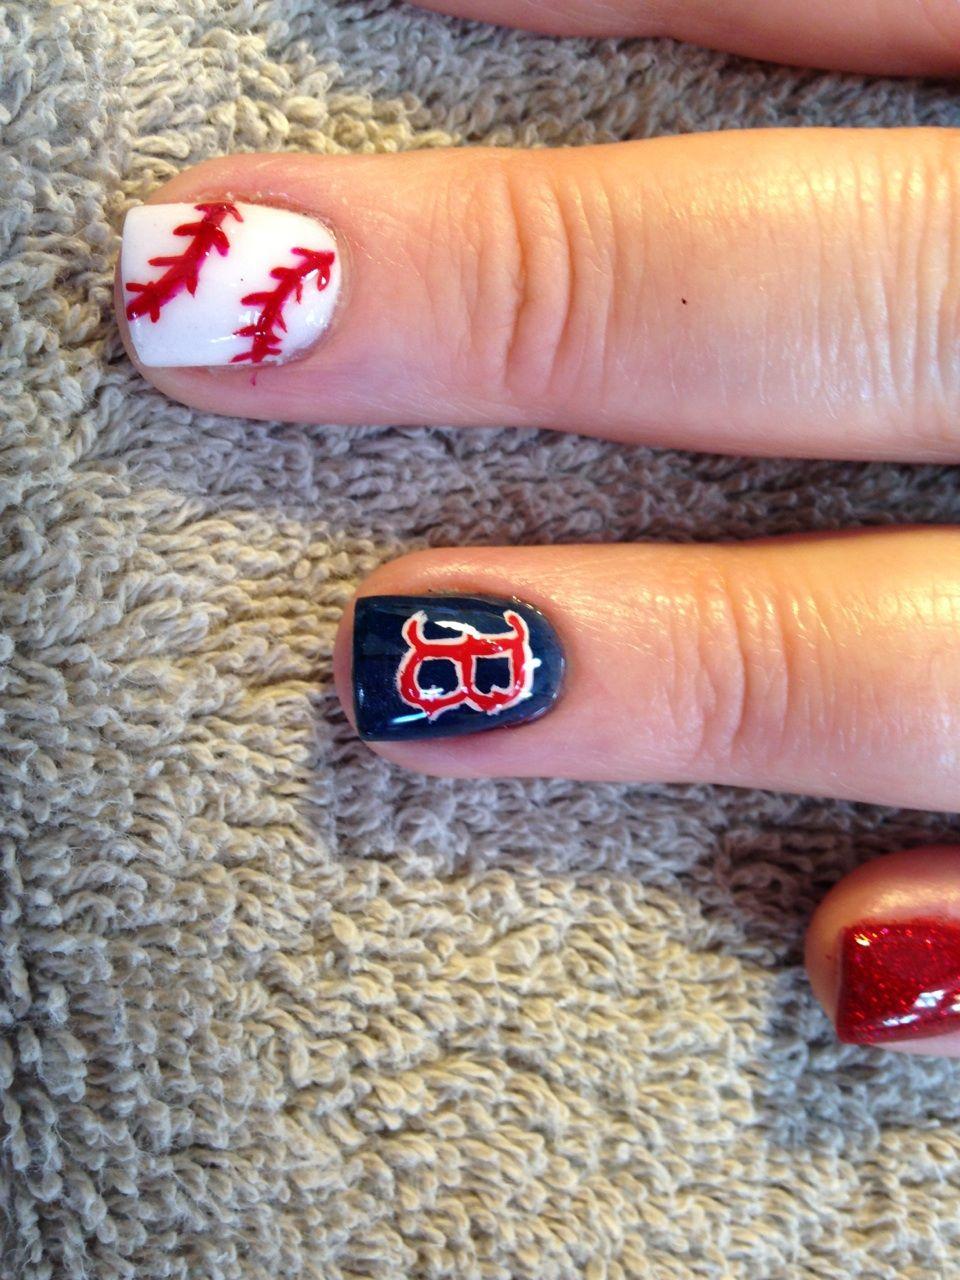 Allure Salon And Spa In Leominster Ma At Vagaro Com Red Sox Nails Boston Red Sox Nails Nails By Lisa